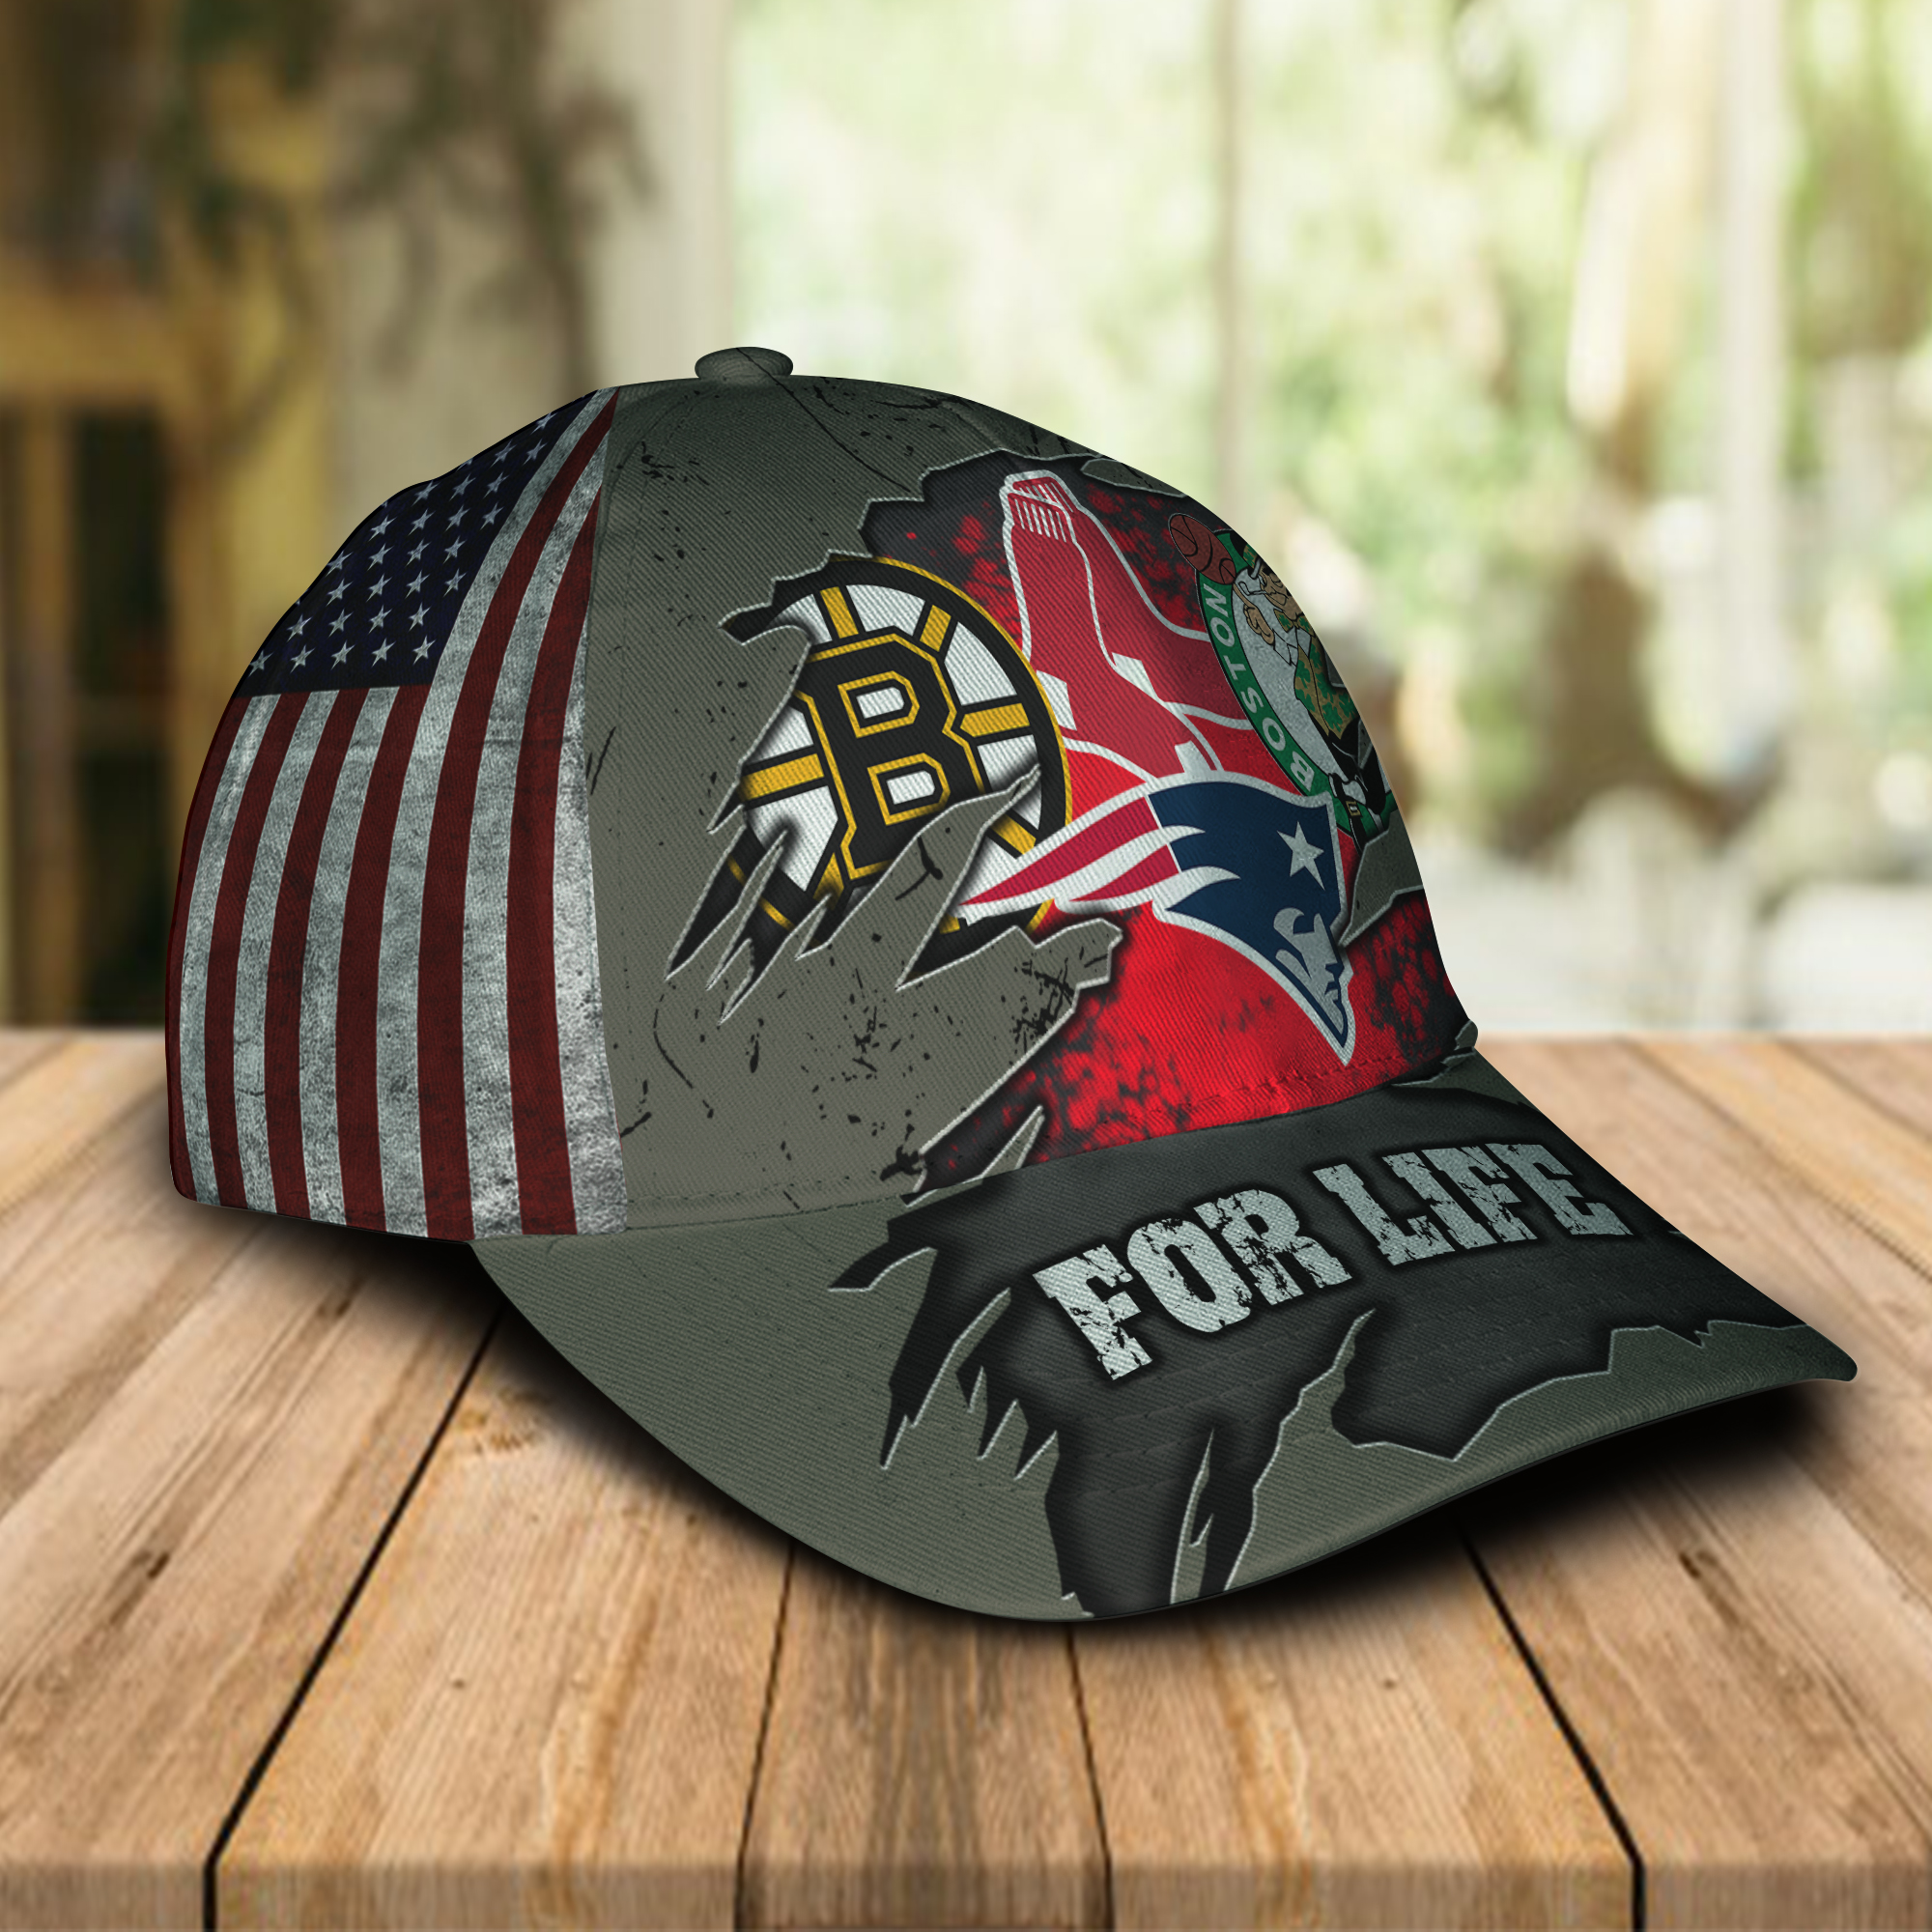 Boston-Celtics-New-England-Patriots-Boston-Bruins-Boston-Red-Sox-For-Life-Cap-Hat-1